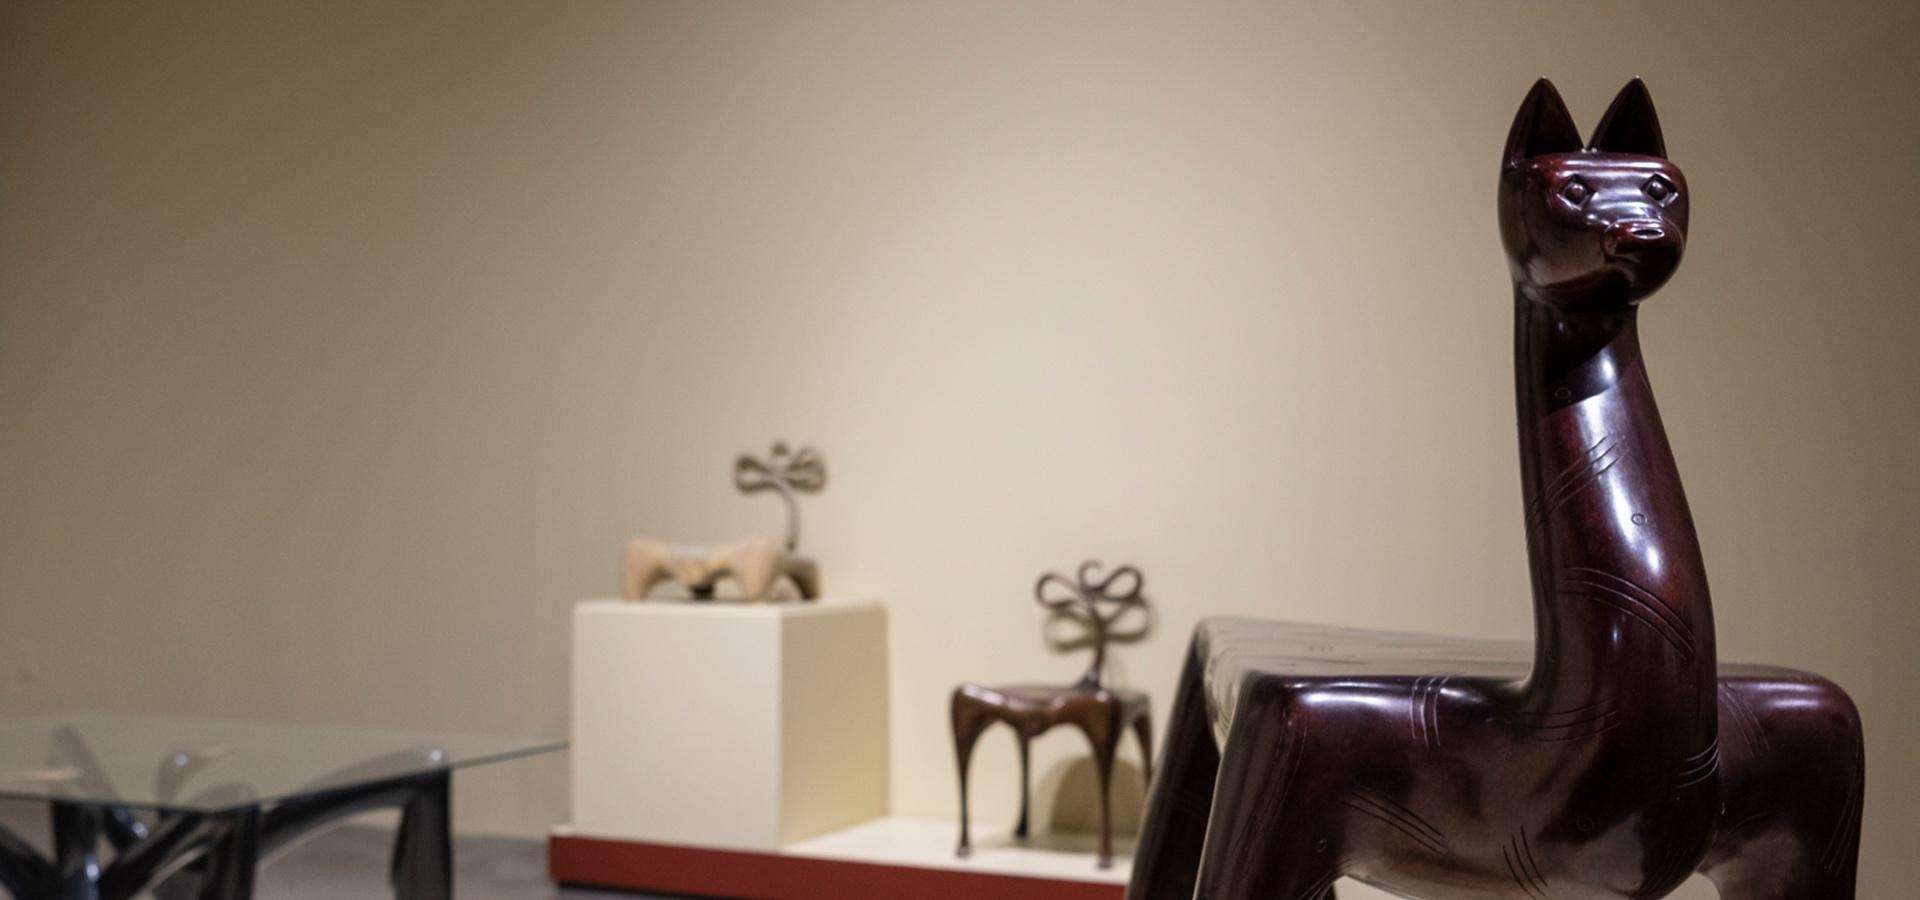 Sculptures in cast bronze and wood